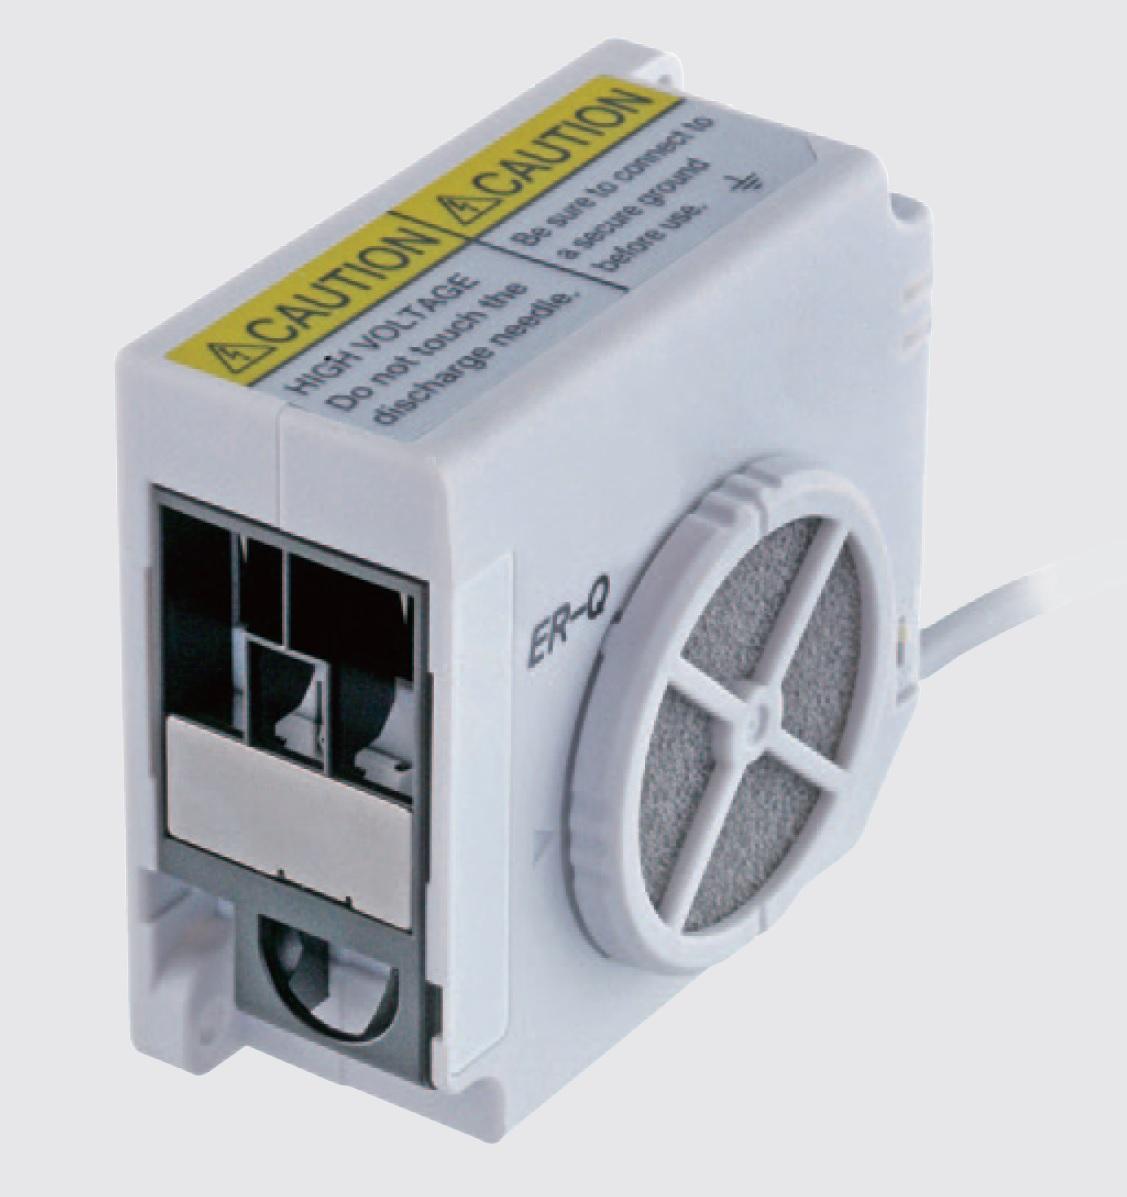 PANASONIC / SUNX ER-Q SERIES เครื่องกำจัดประจุไฟฟ้าสถิต